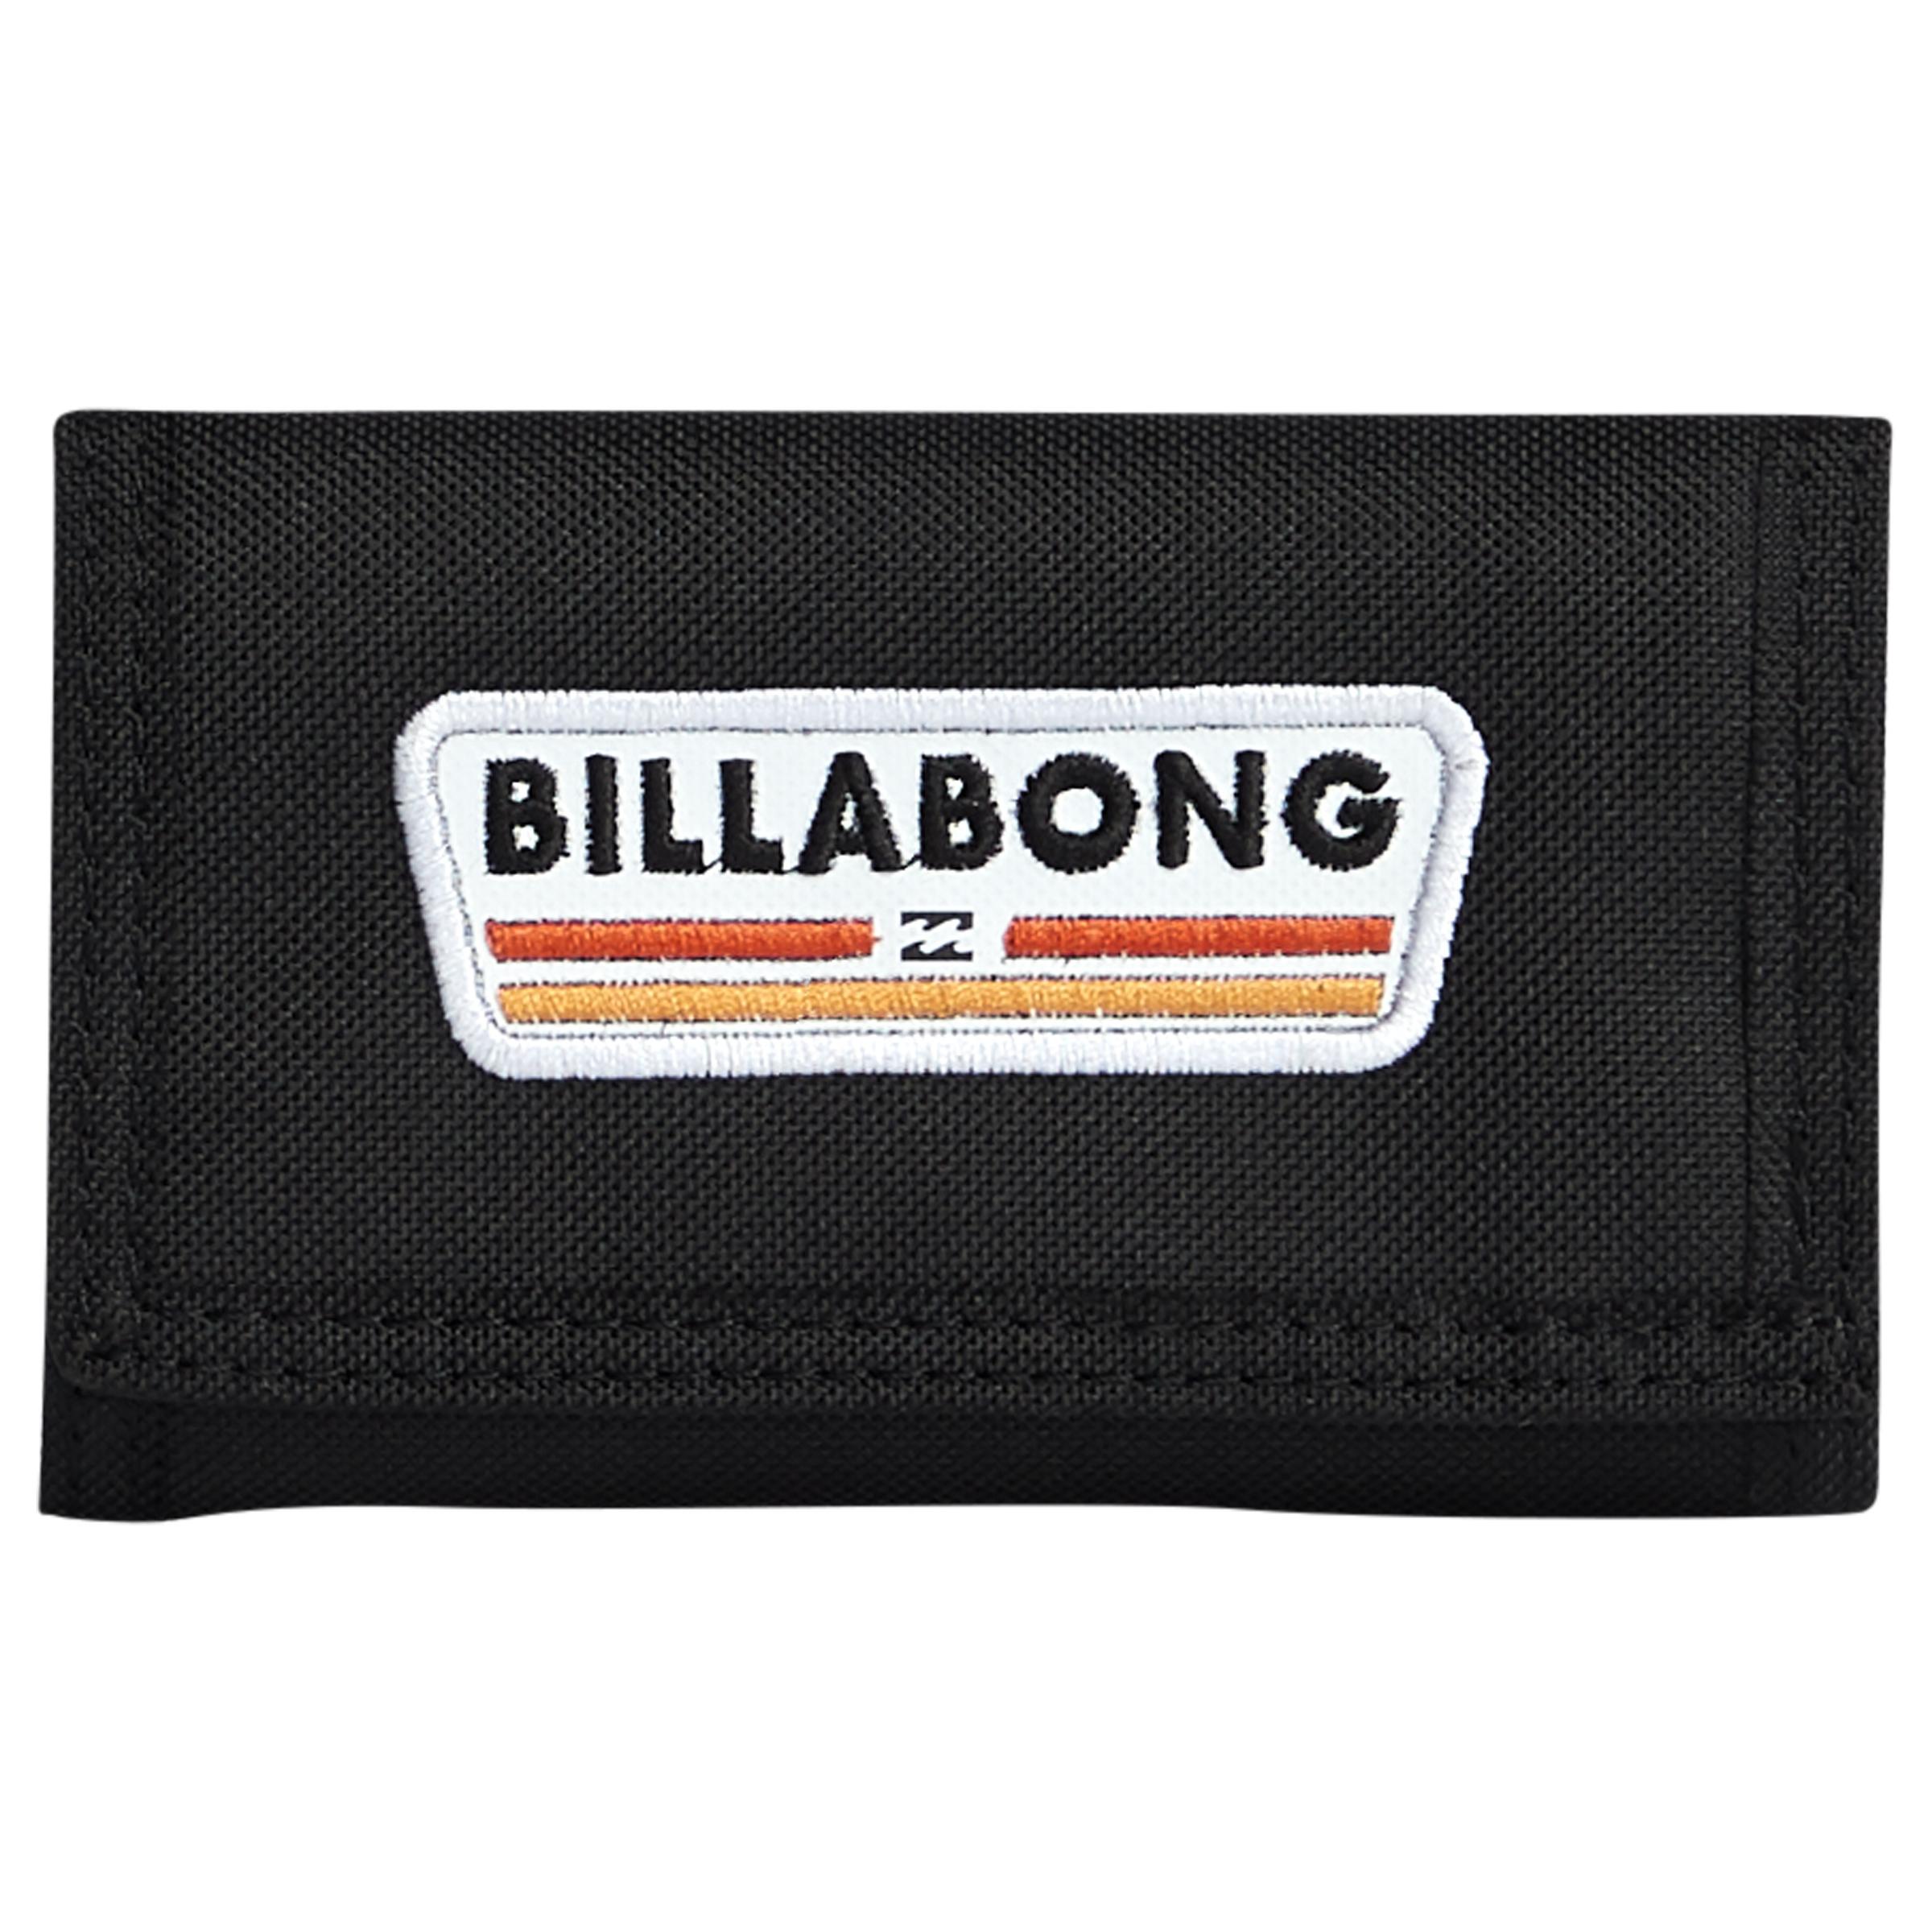 Cartera Billabong Wallet Black